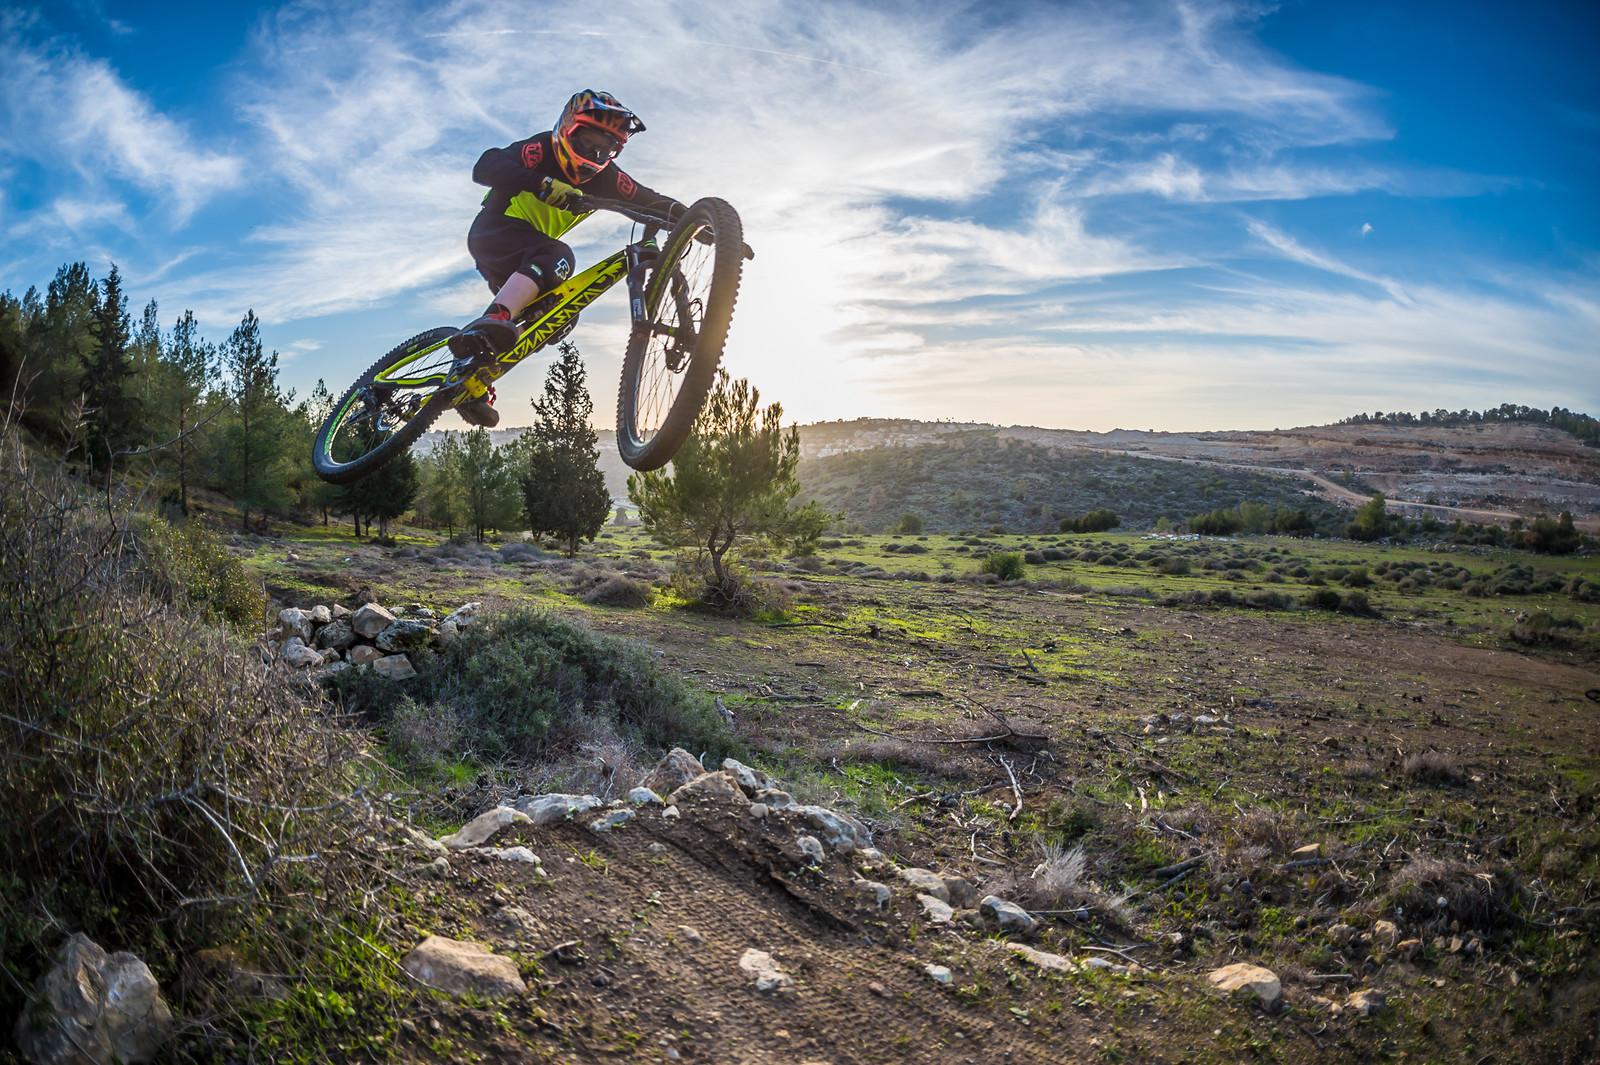 Sunset Sender - iceman2058 - Mountain Biking Pictures - Vital MTB